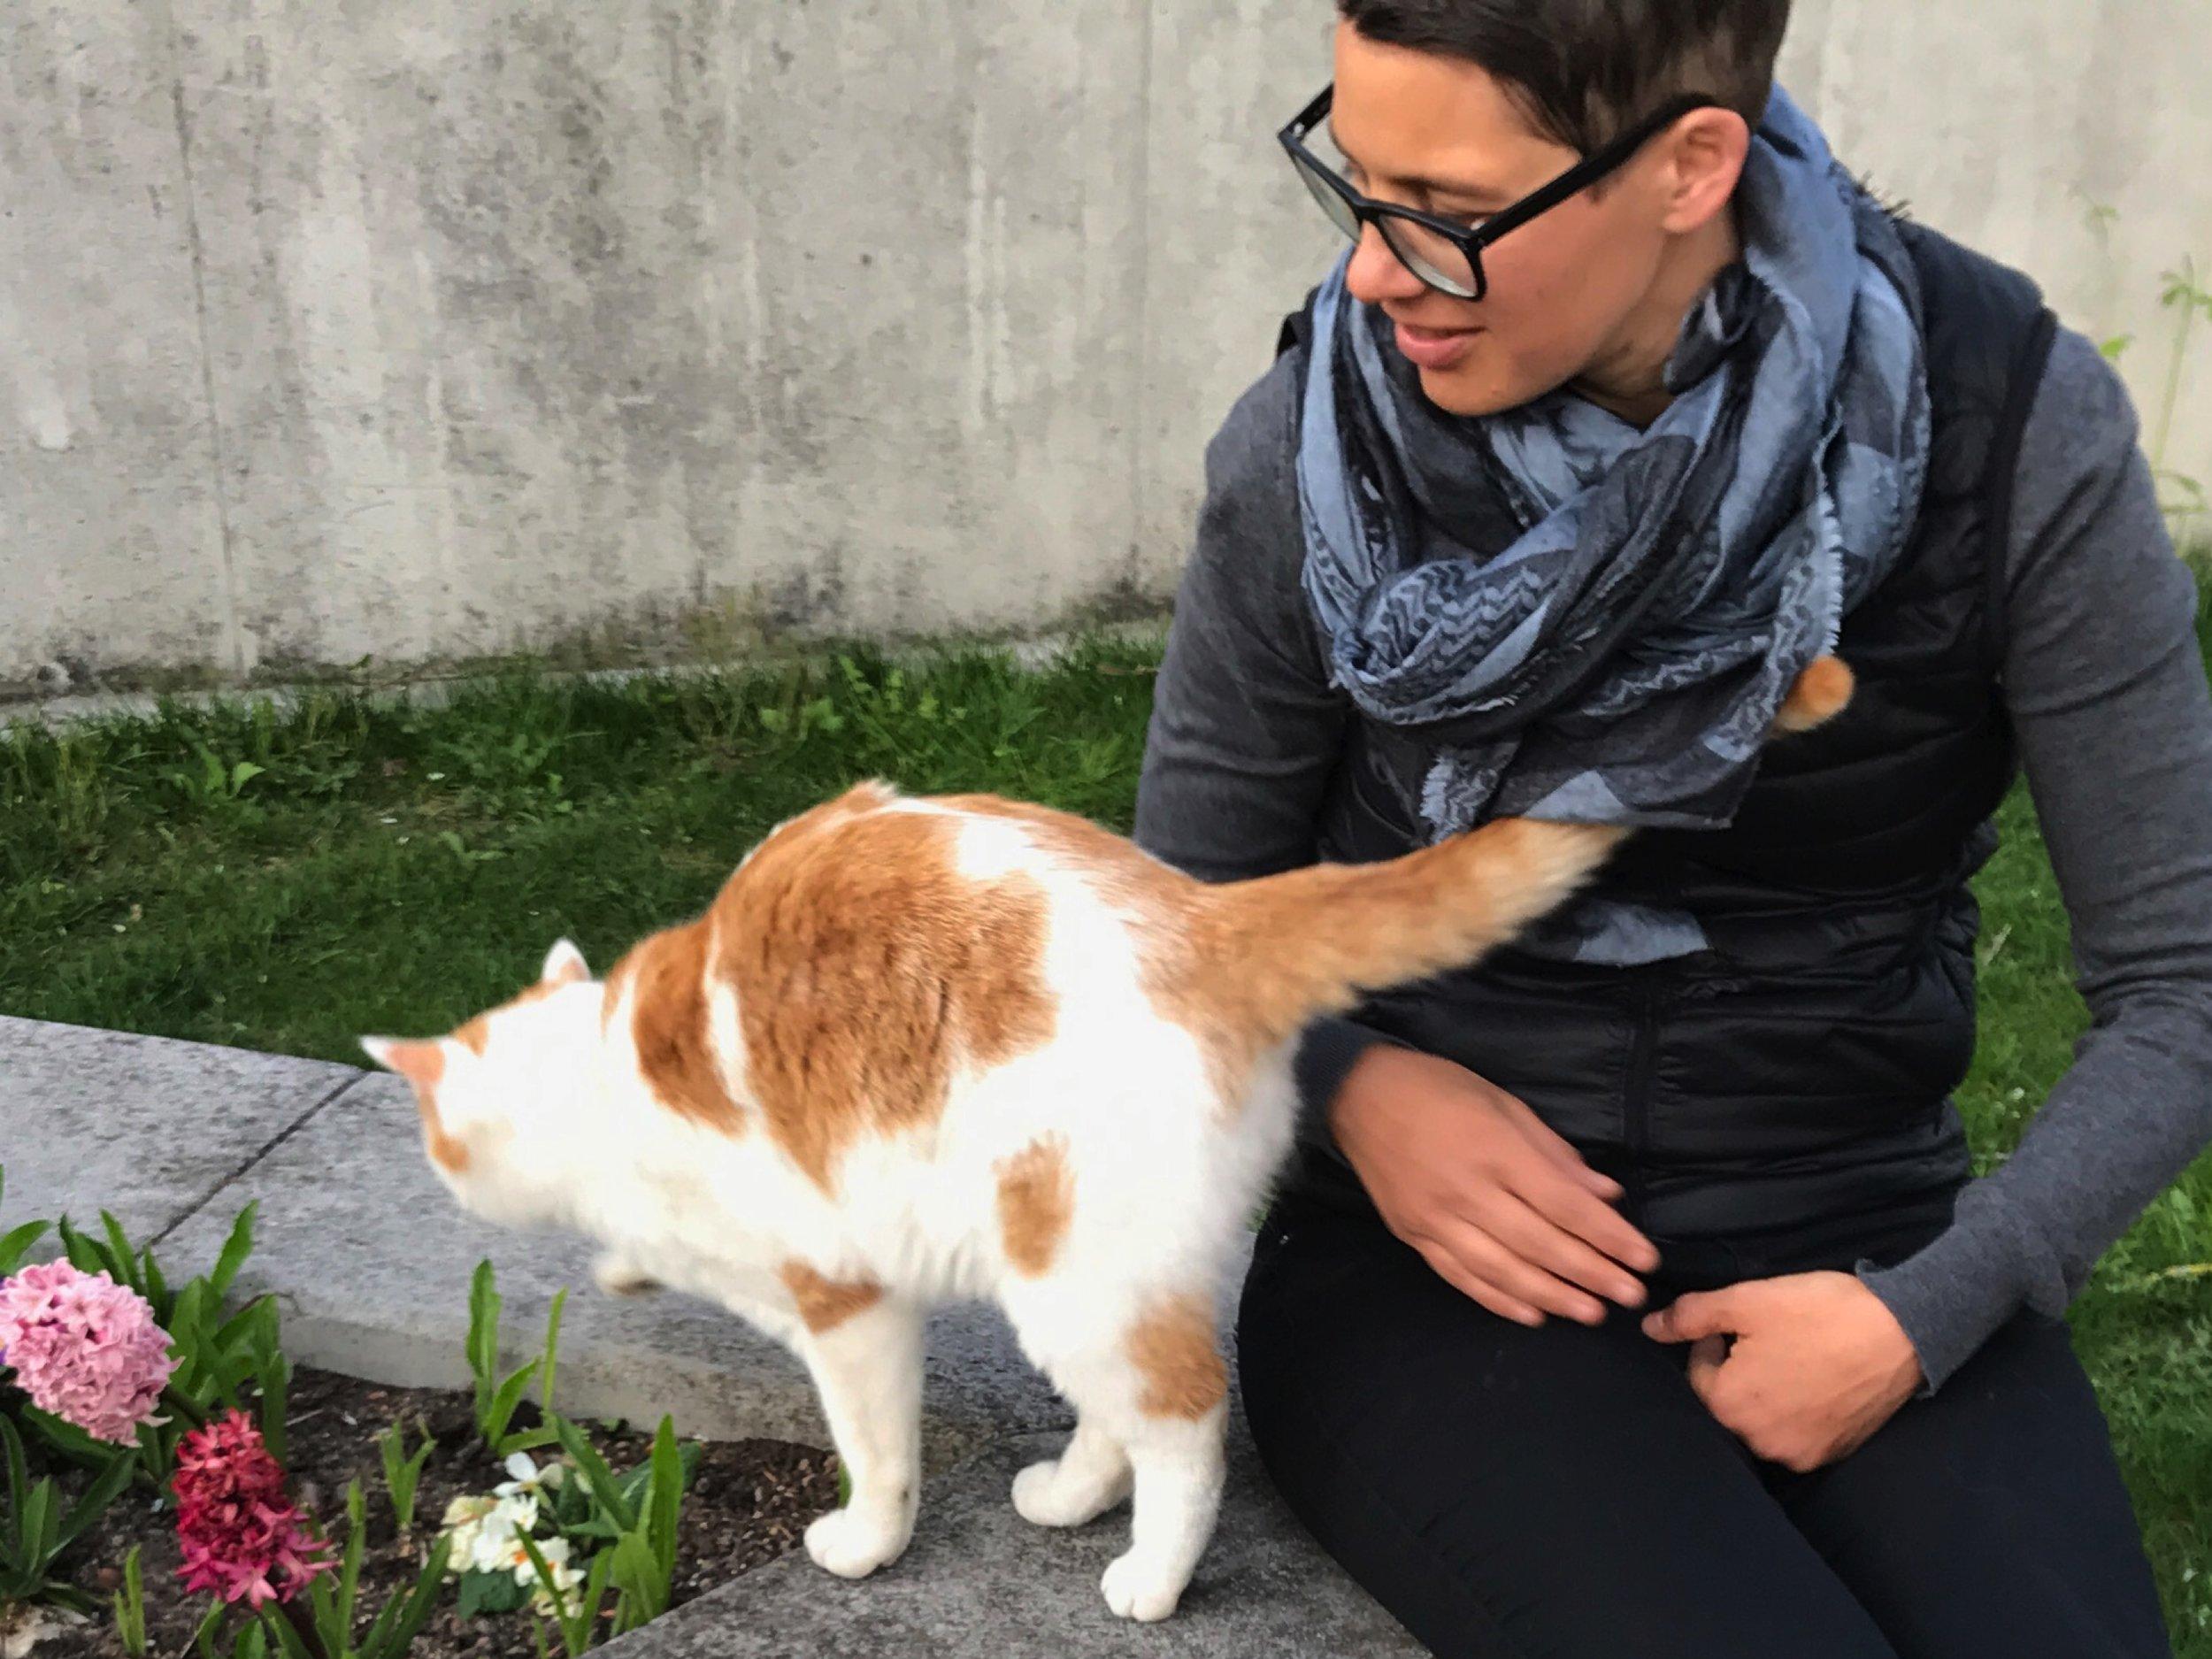 Or petting Fantastic the cat.